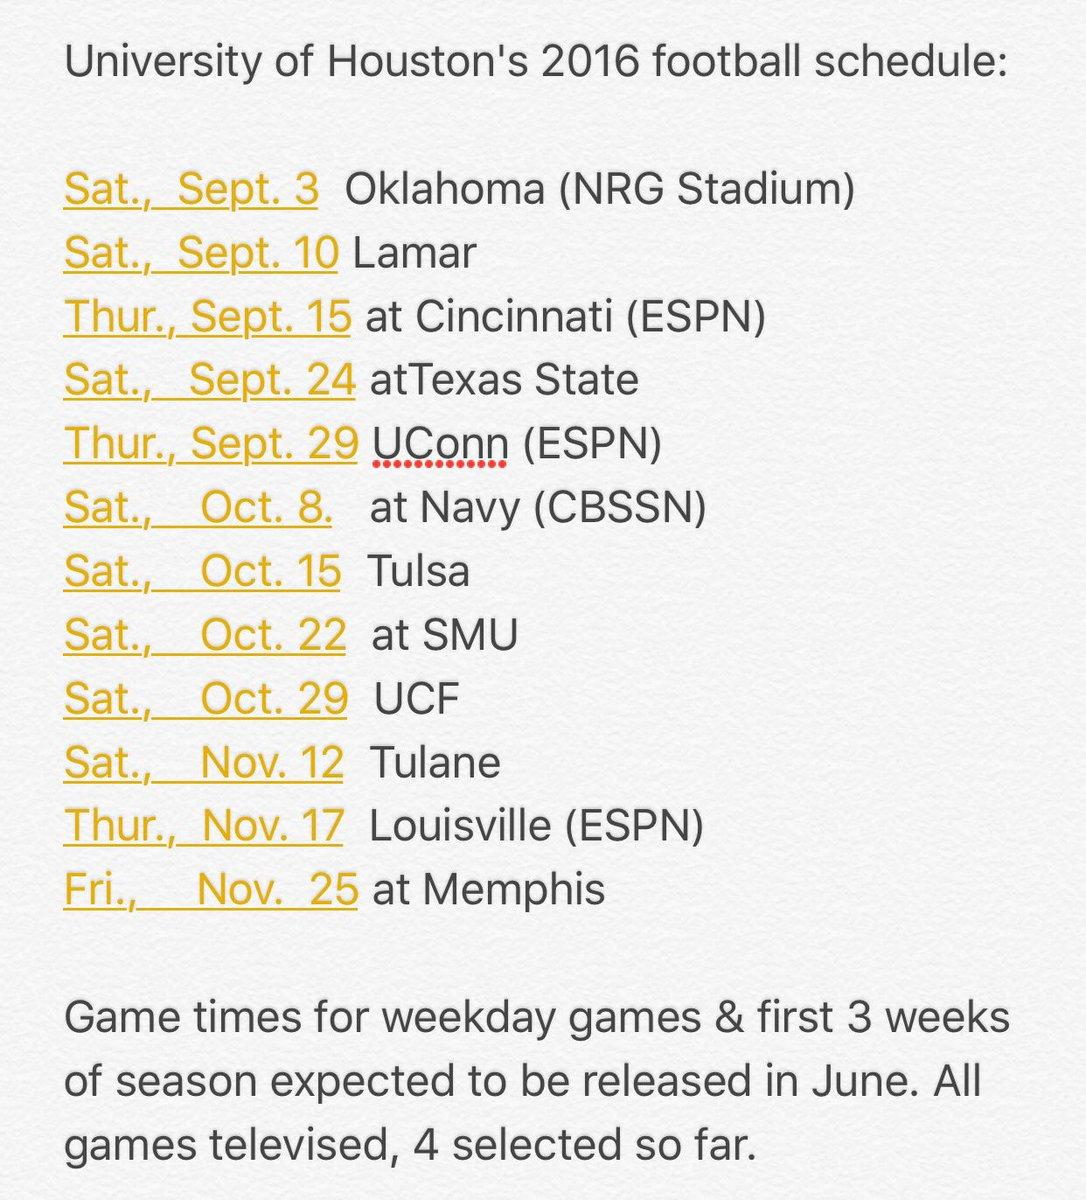 University of Houston's 2016 football schedule